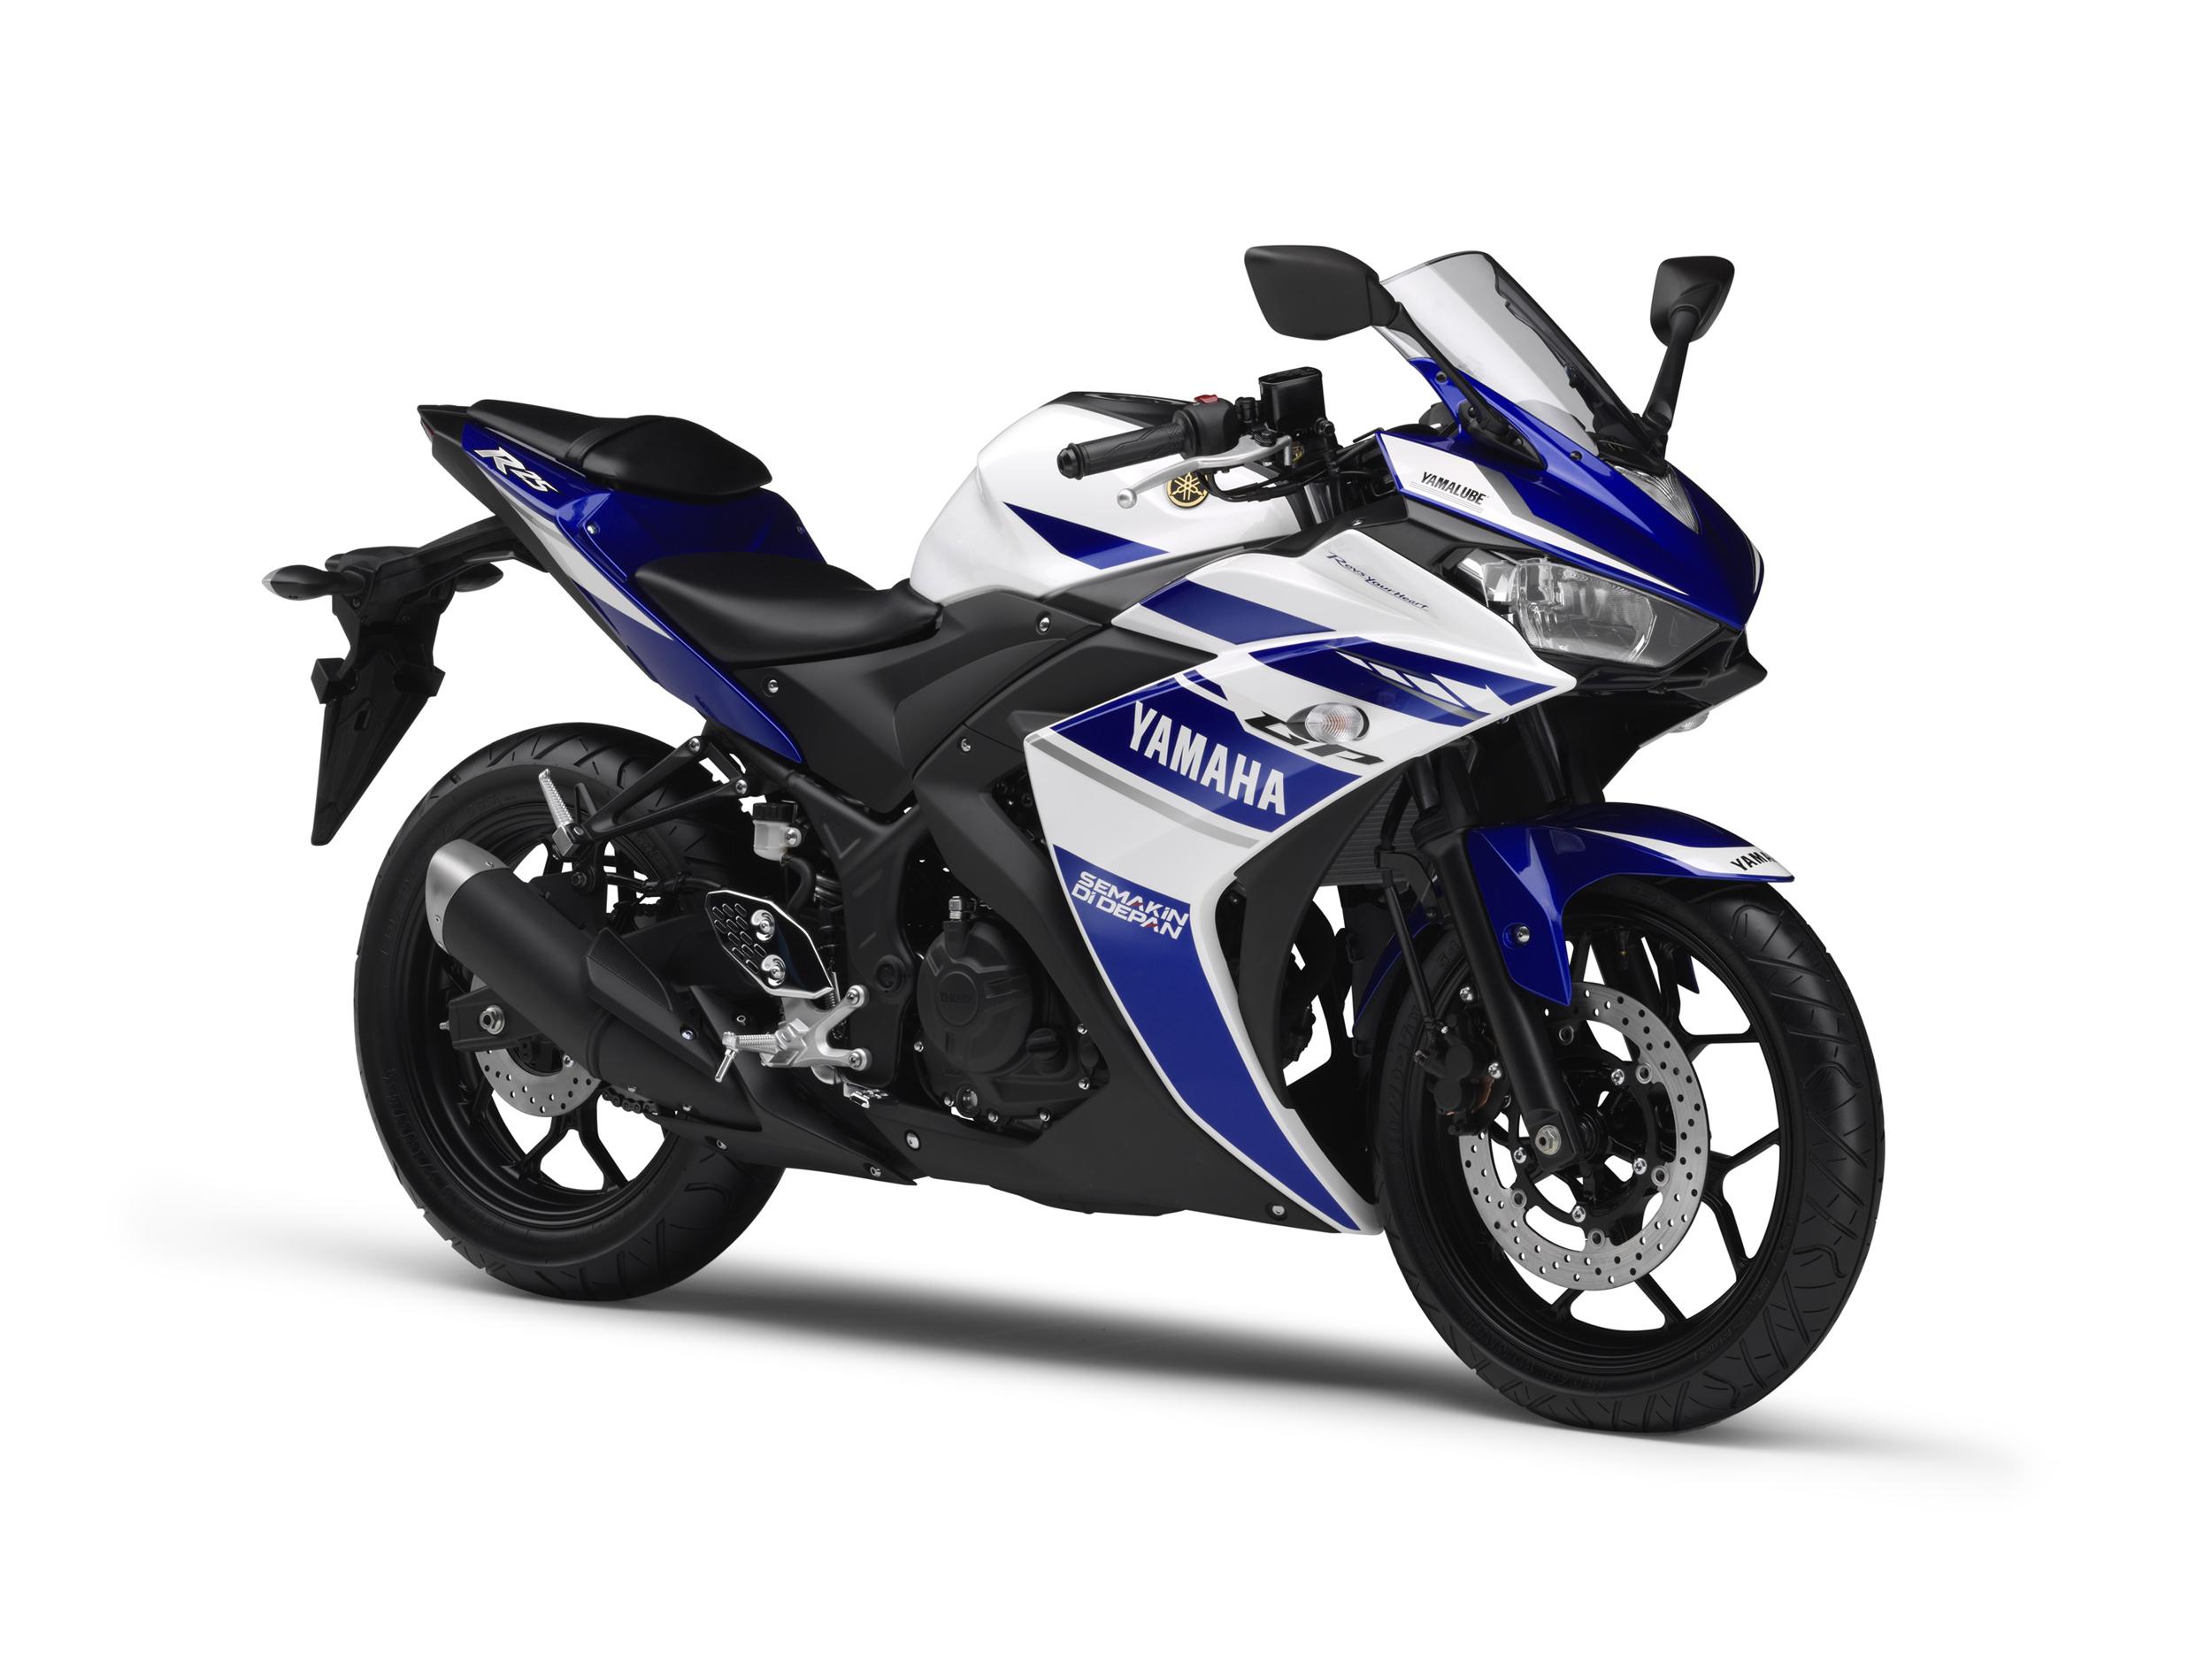 Production yamaha r25 finally unveiled